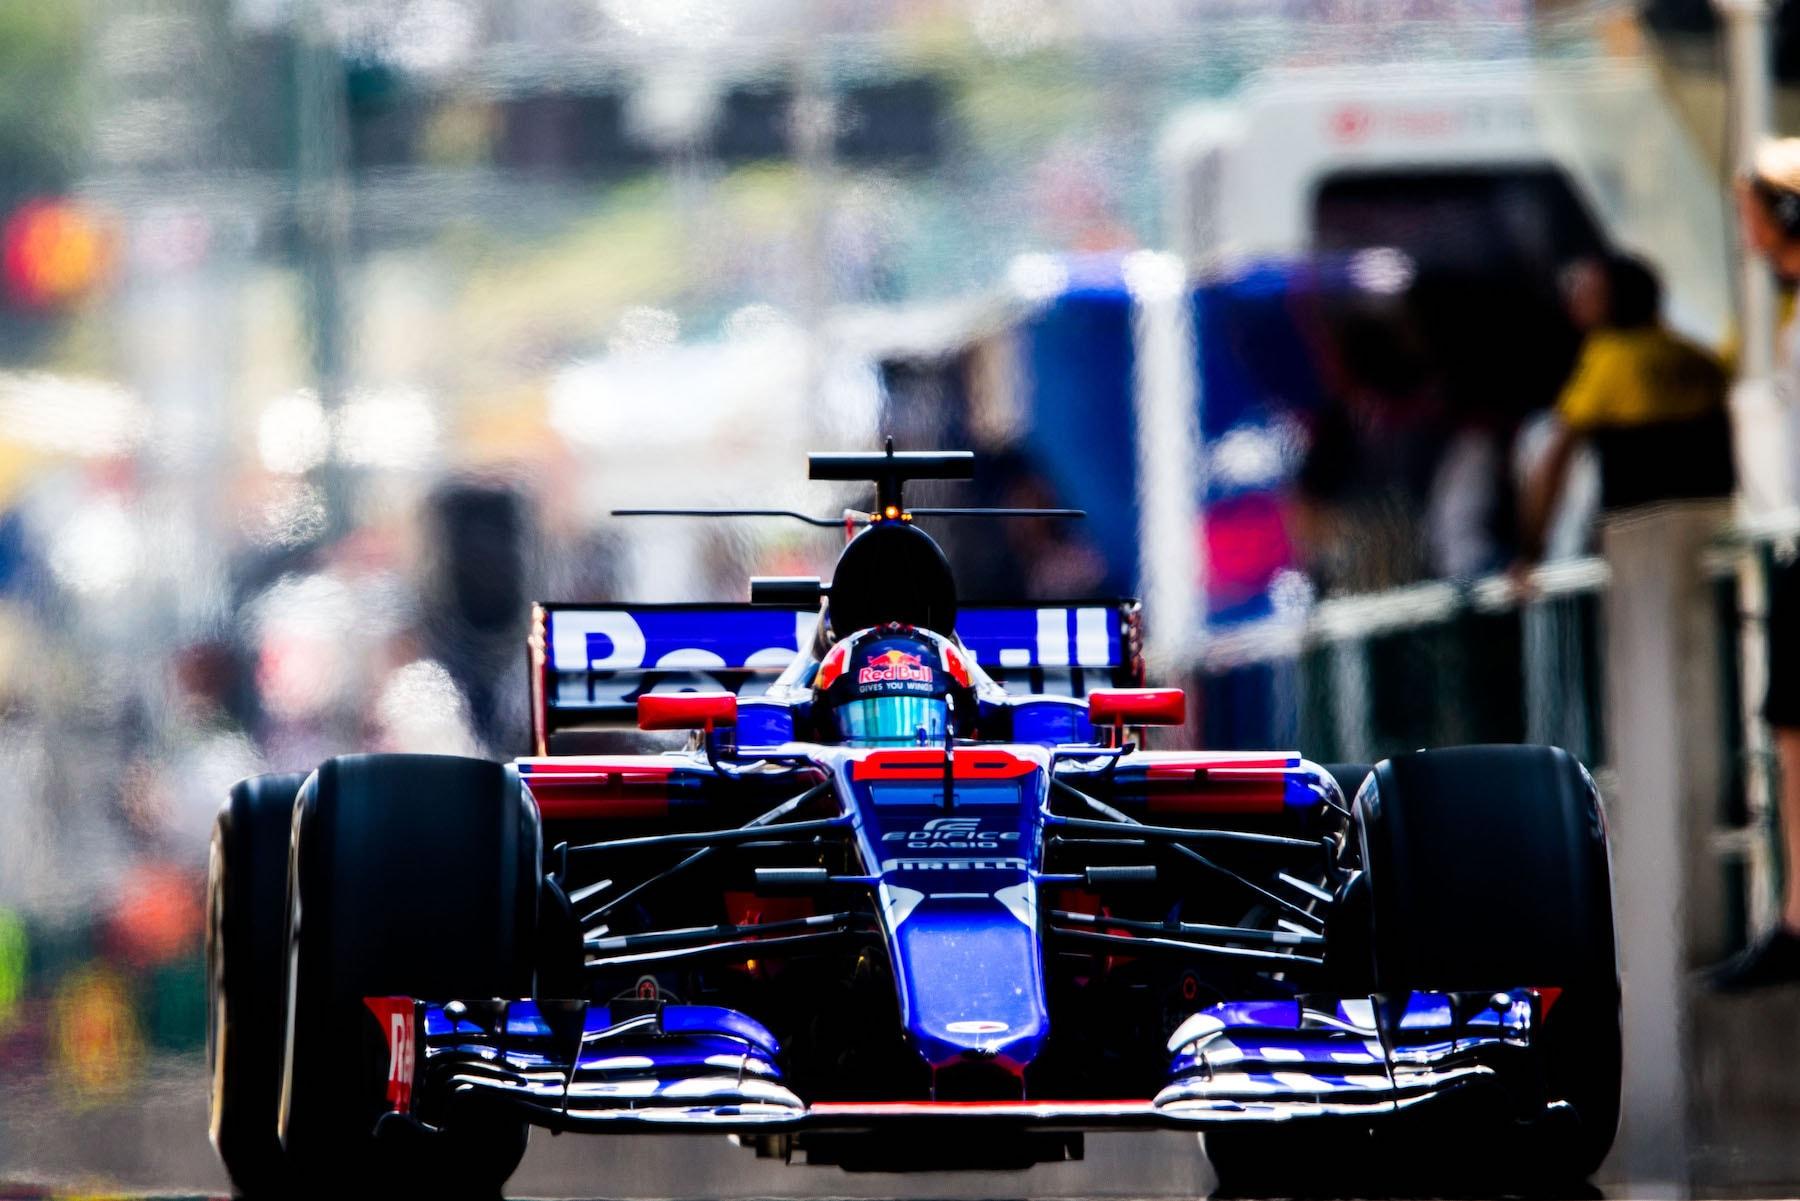 2017 Daniil Kvyat | Toro Rosso STR12 | 2017 Hungarian GP Q1 1 copy.jpg